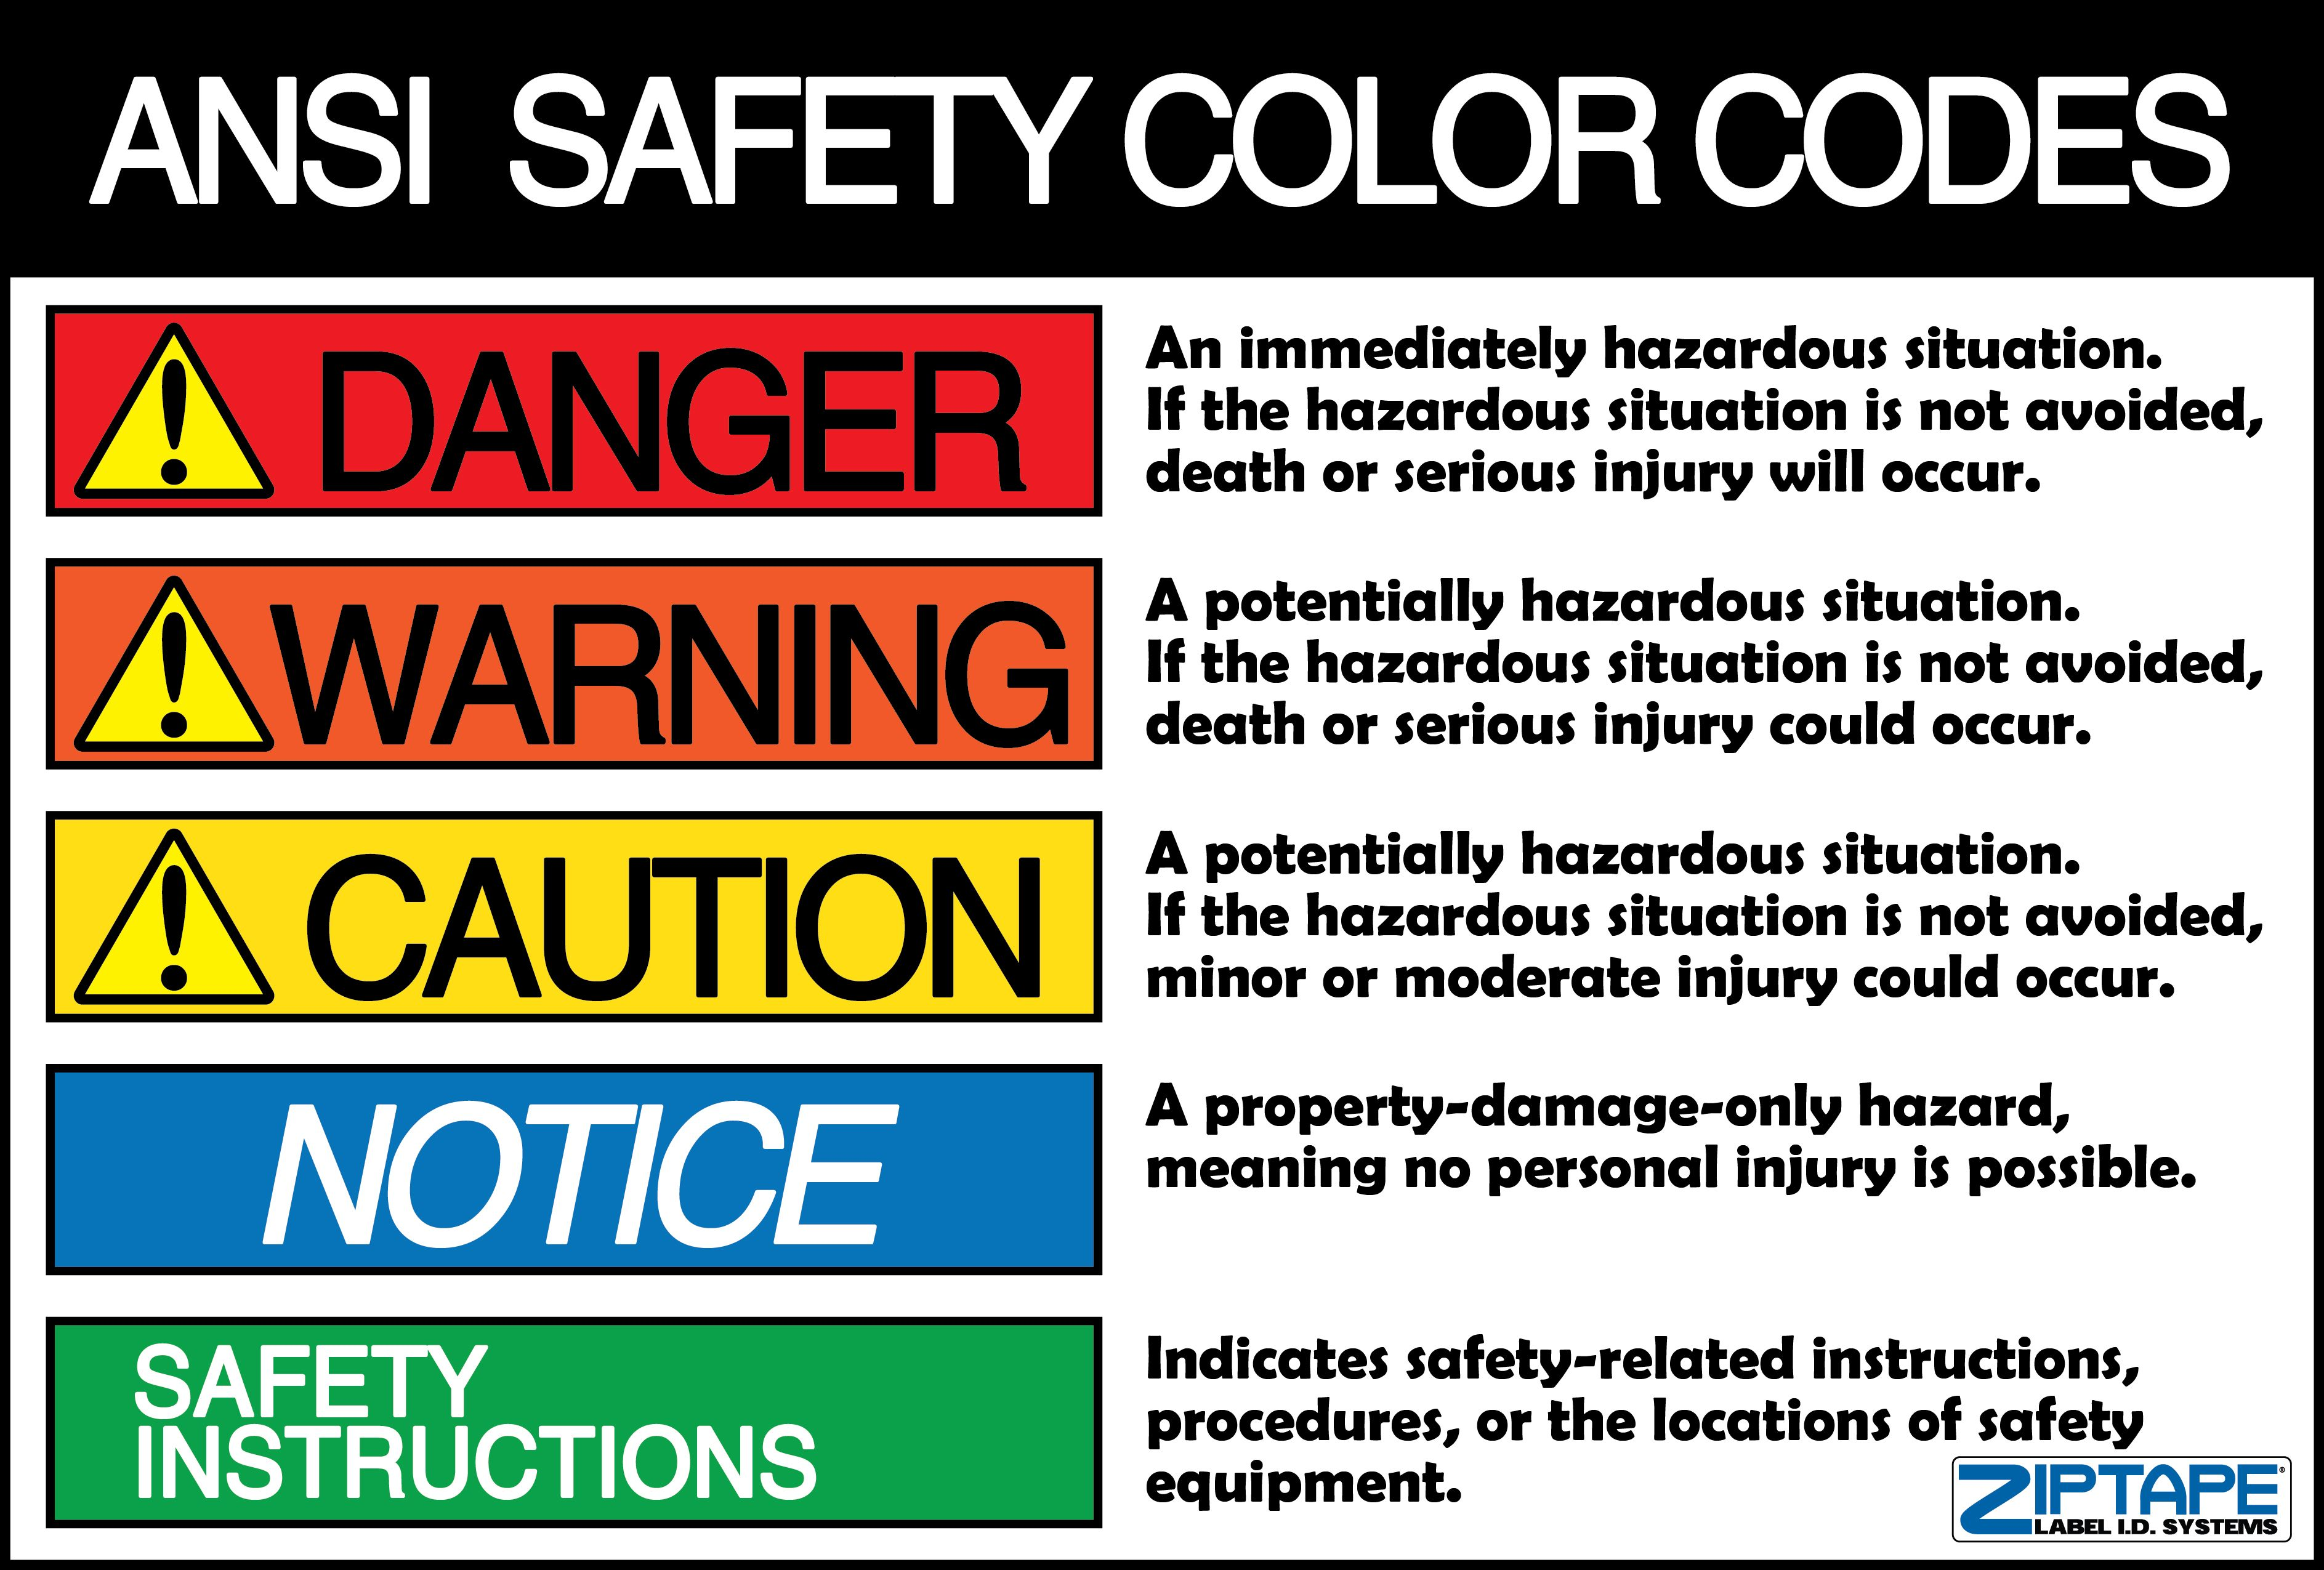 Ansi z5351 safety color codes coding color coding color